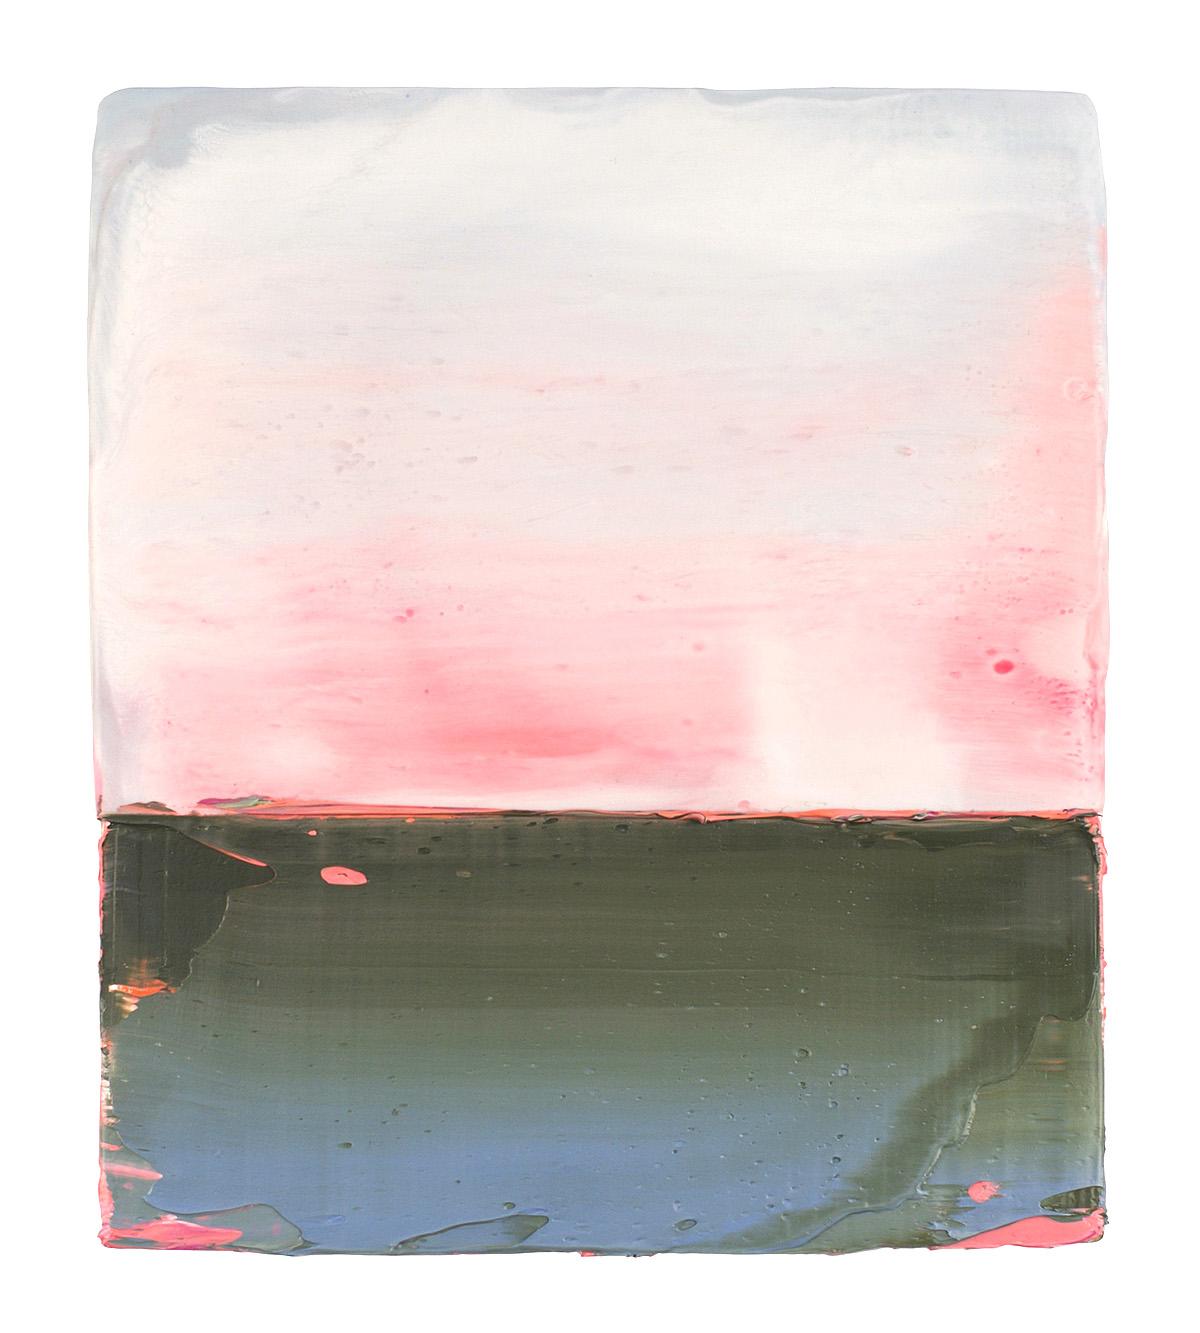 Anke Roder, 'Sunrise, Sundown', encaustic and oils on wood